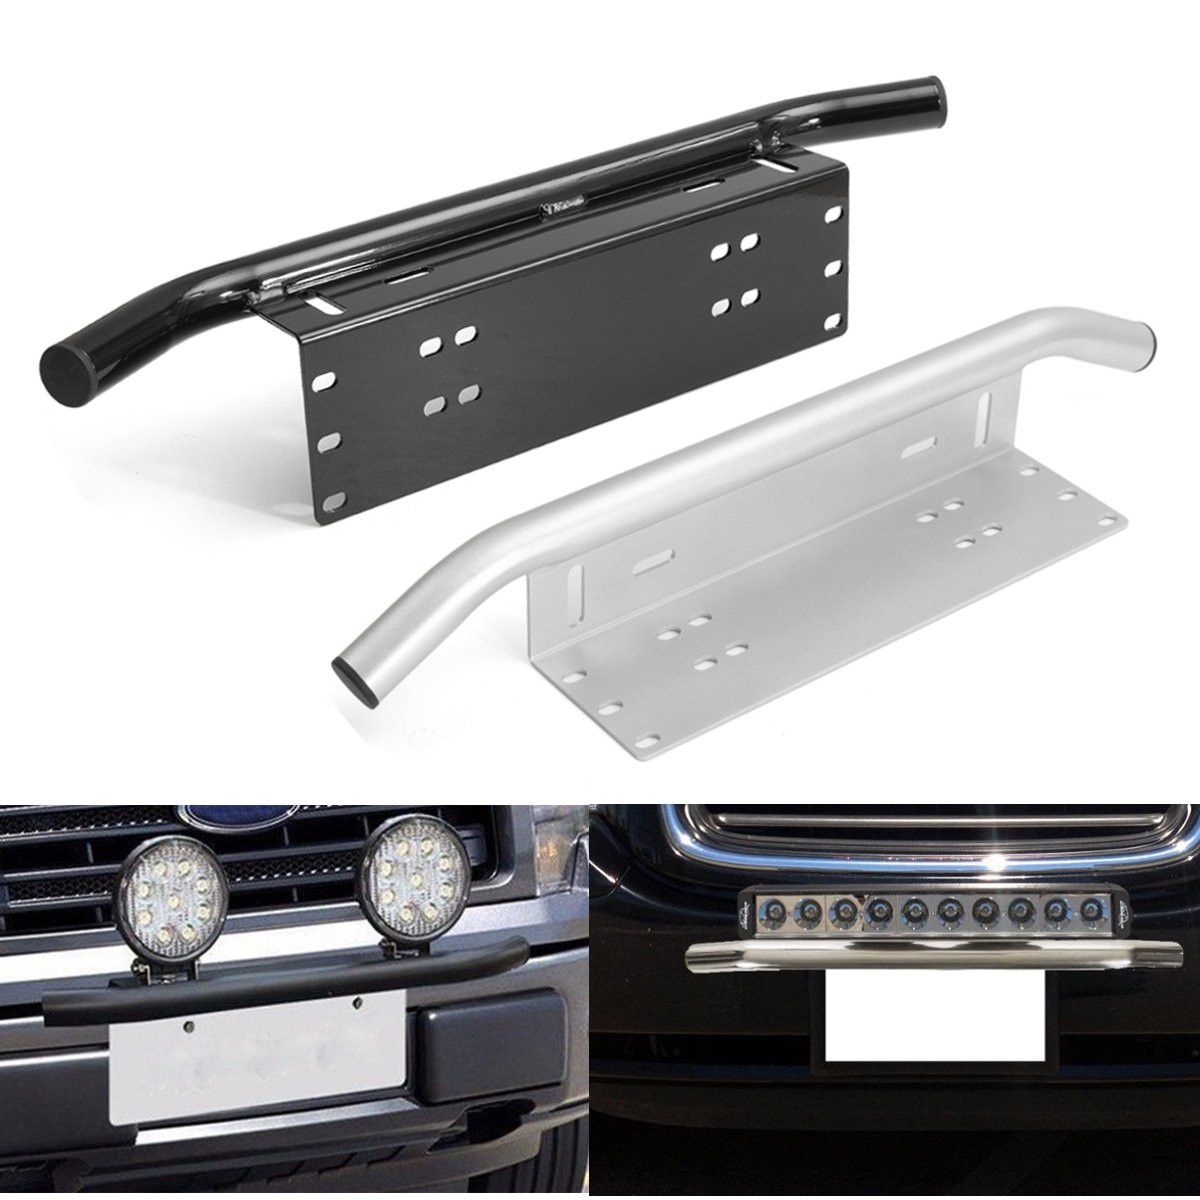 Black Silver Car Bull Bar Front Bumper License Plate Mount